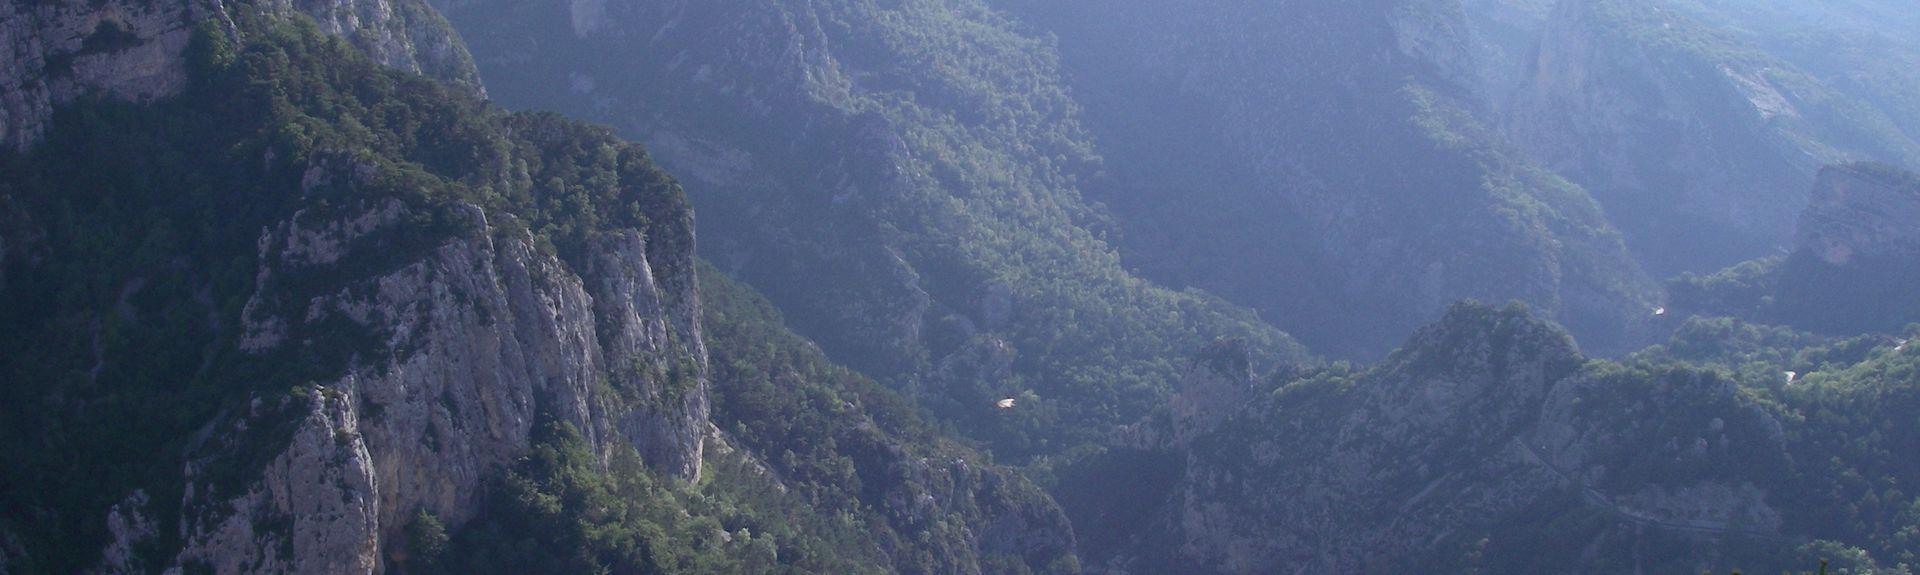 Thorame-Basse, Provenza-Alpes-Costa Azul, Francia